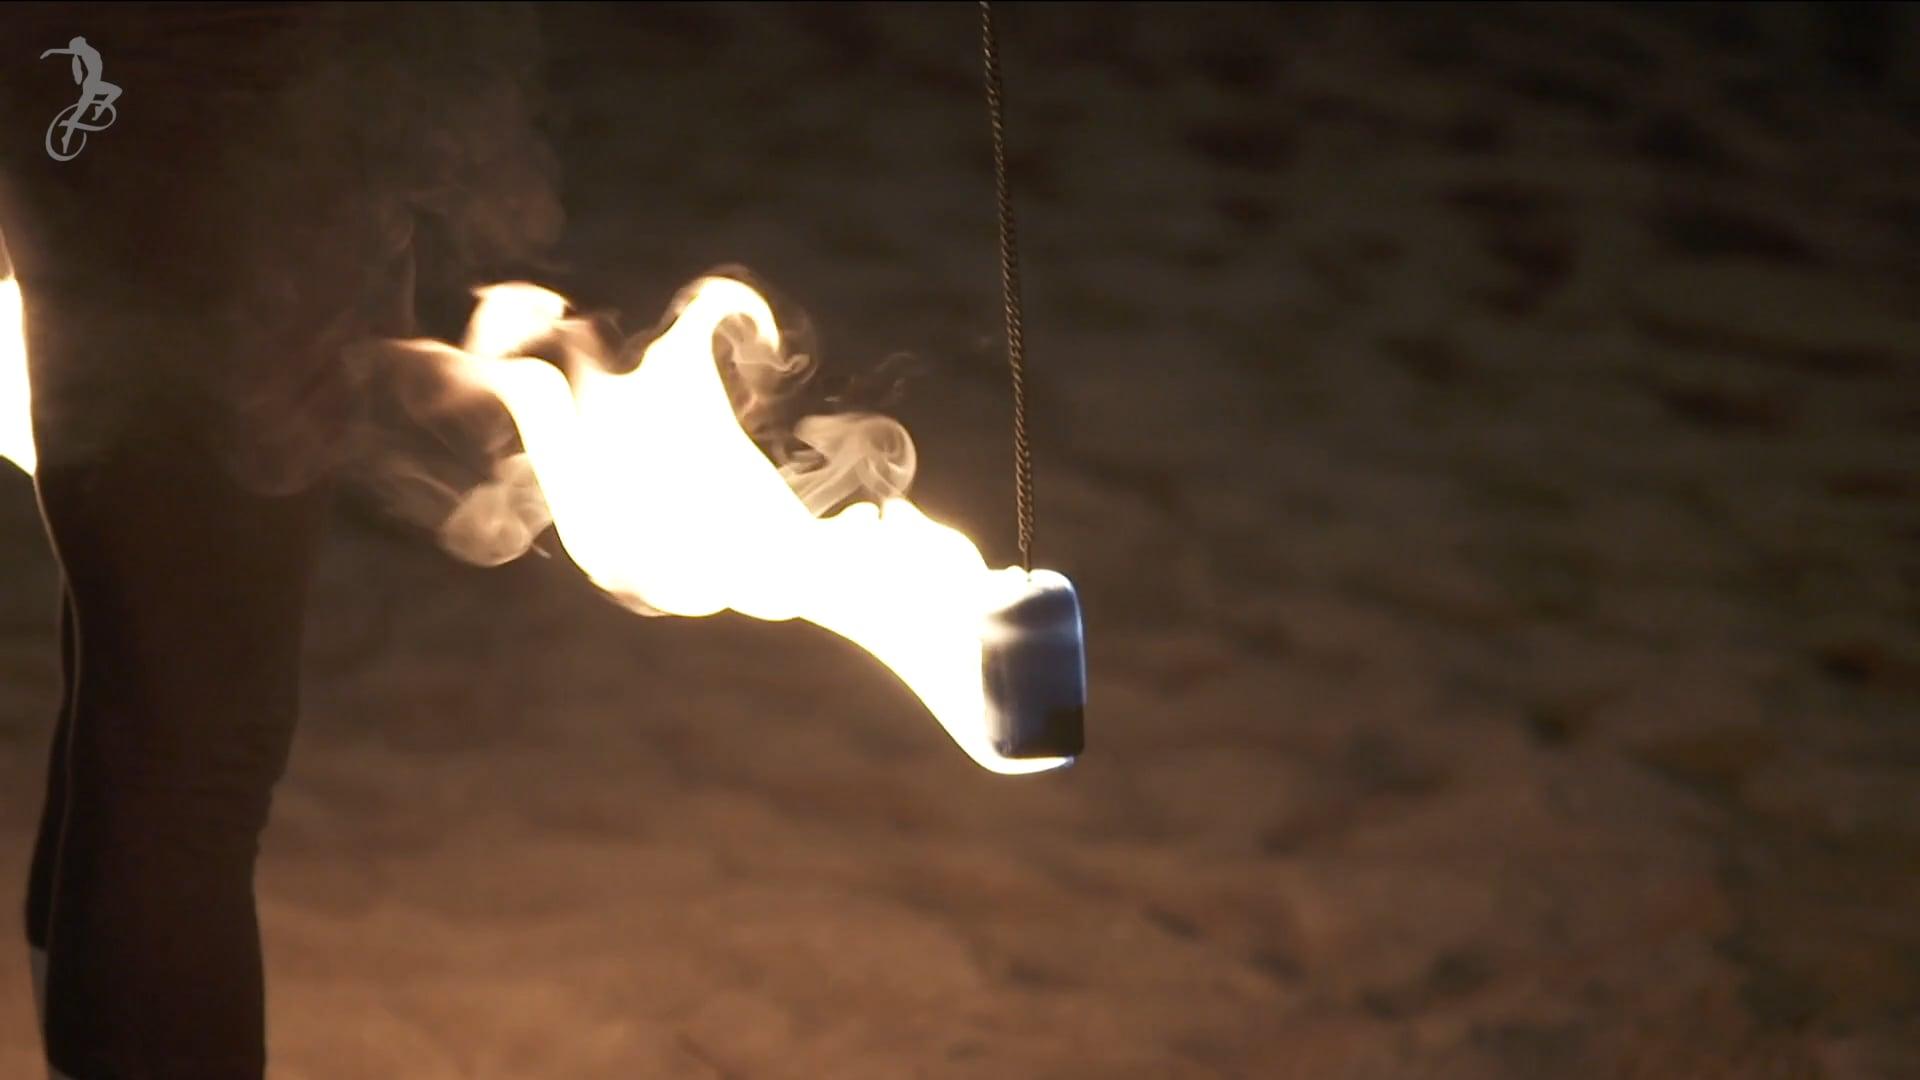 Charlly fire poi